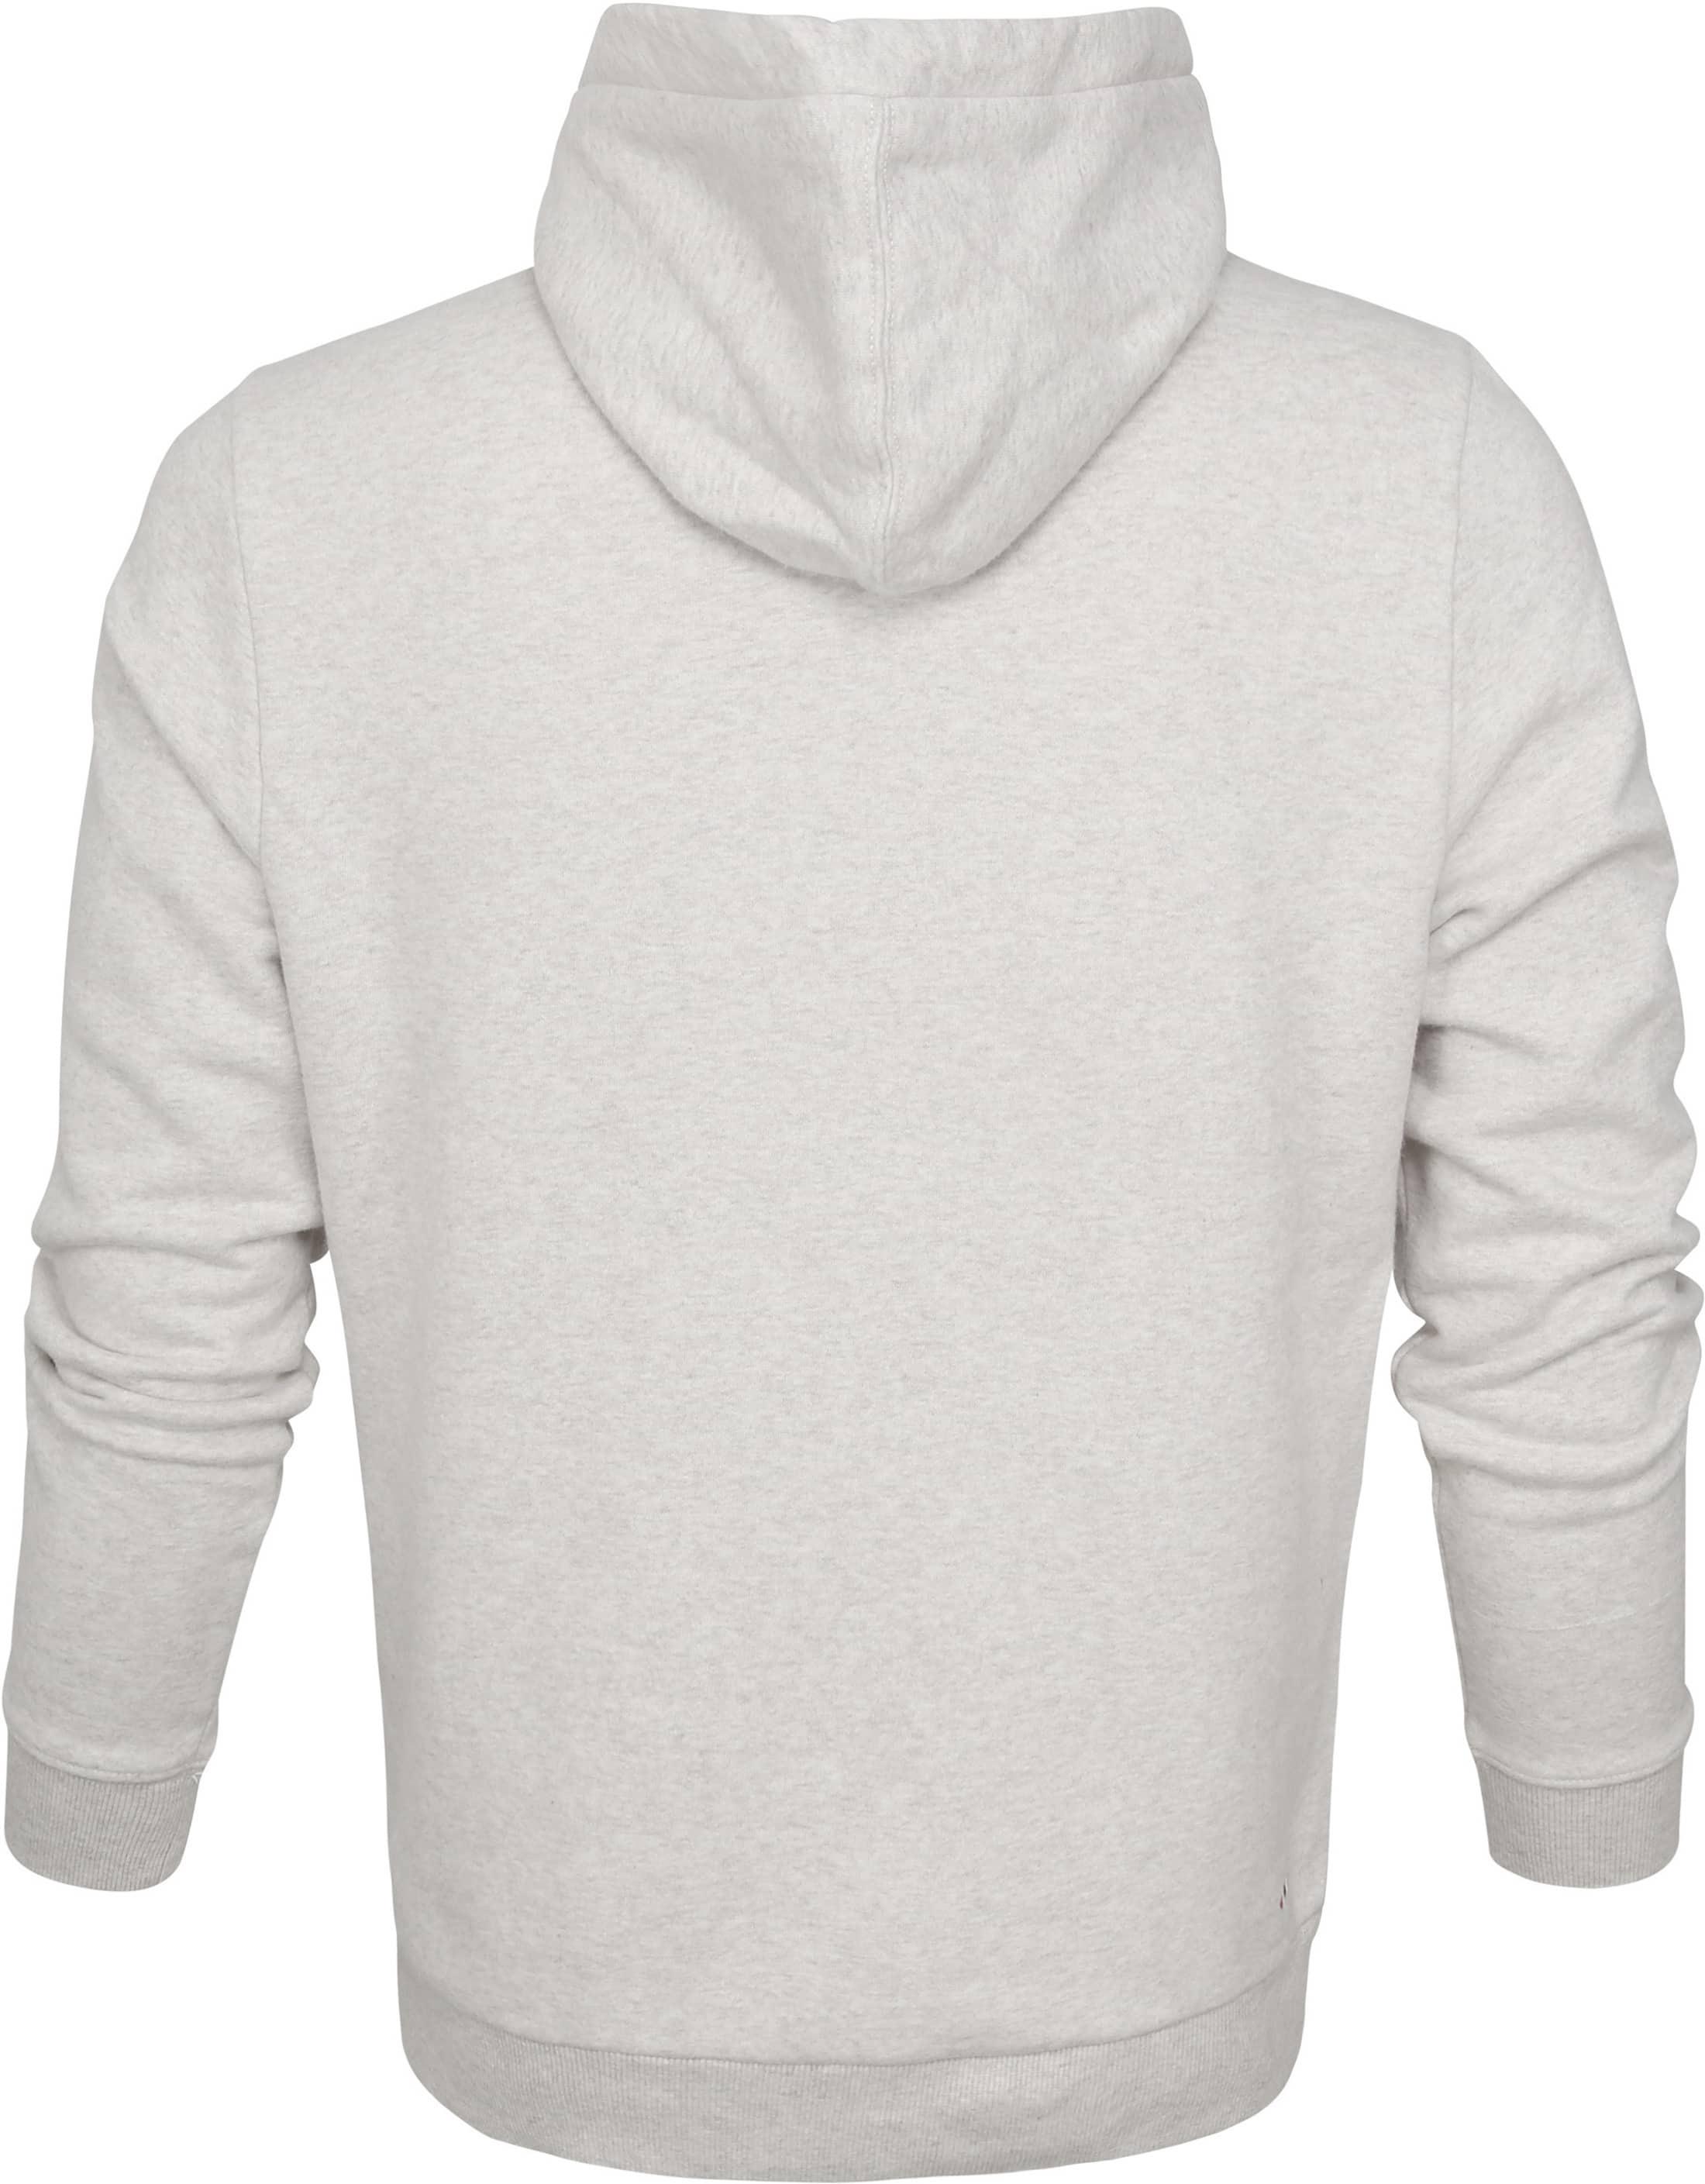 Napapijri Sweater Burgee Light Grey foto 3